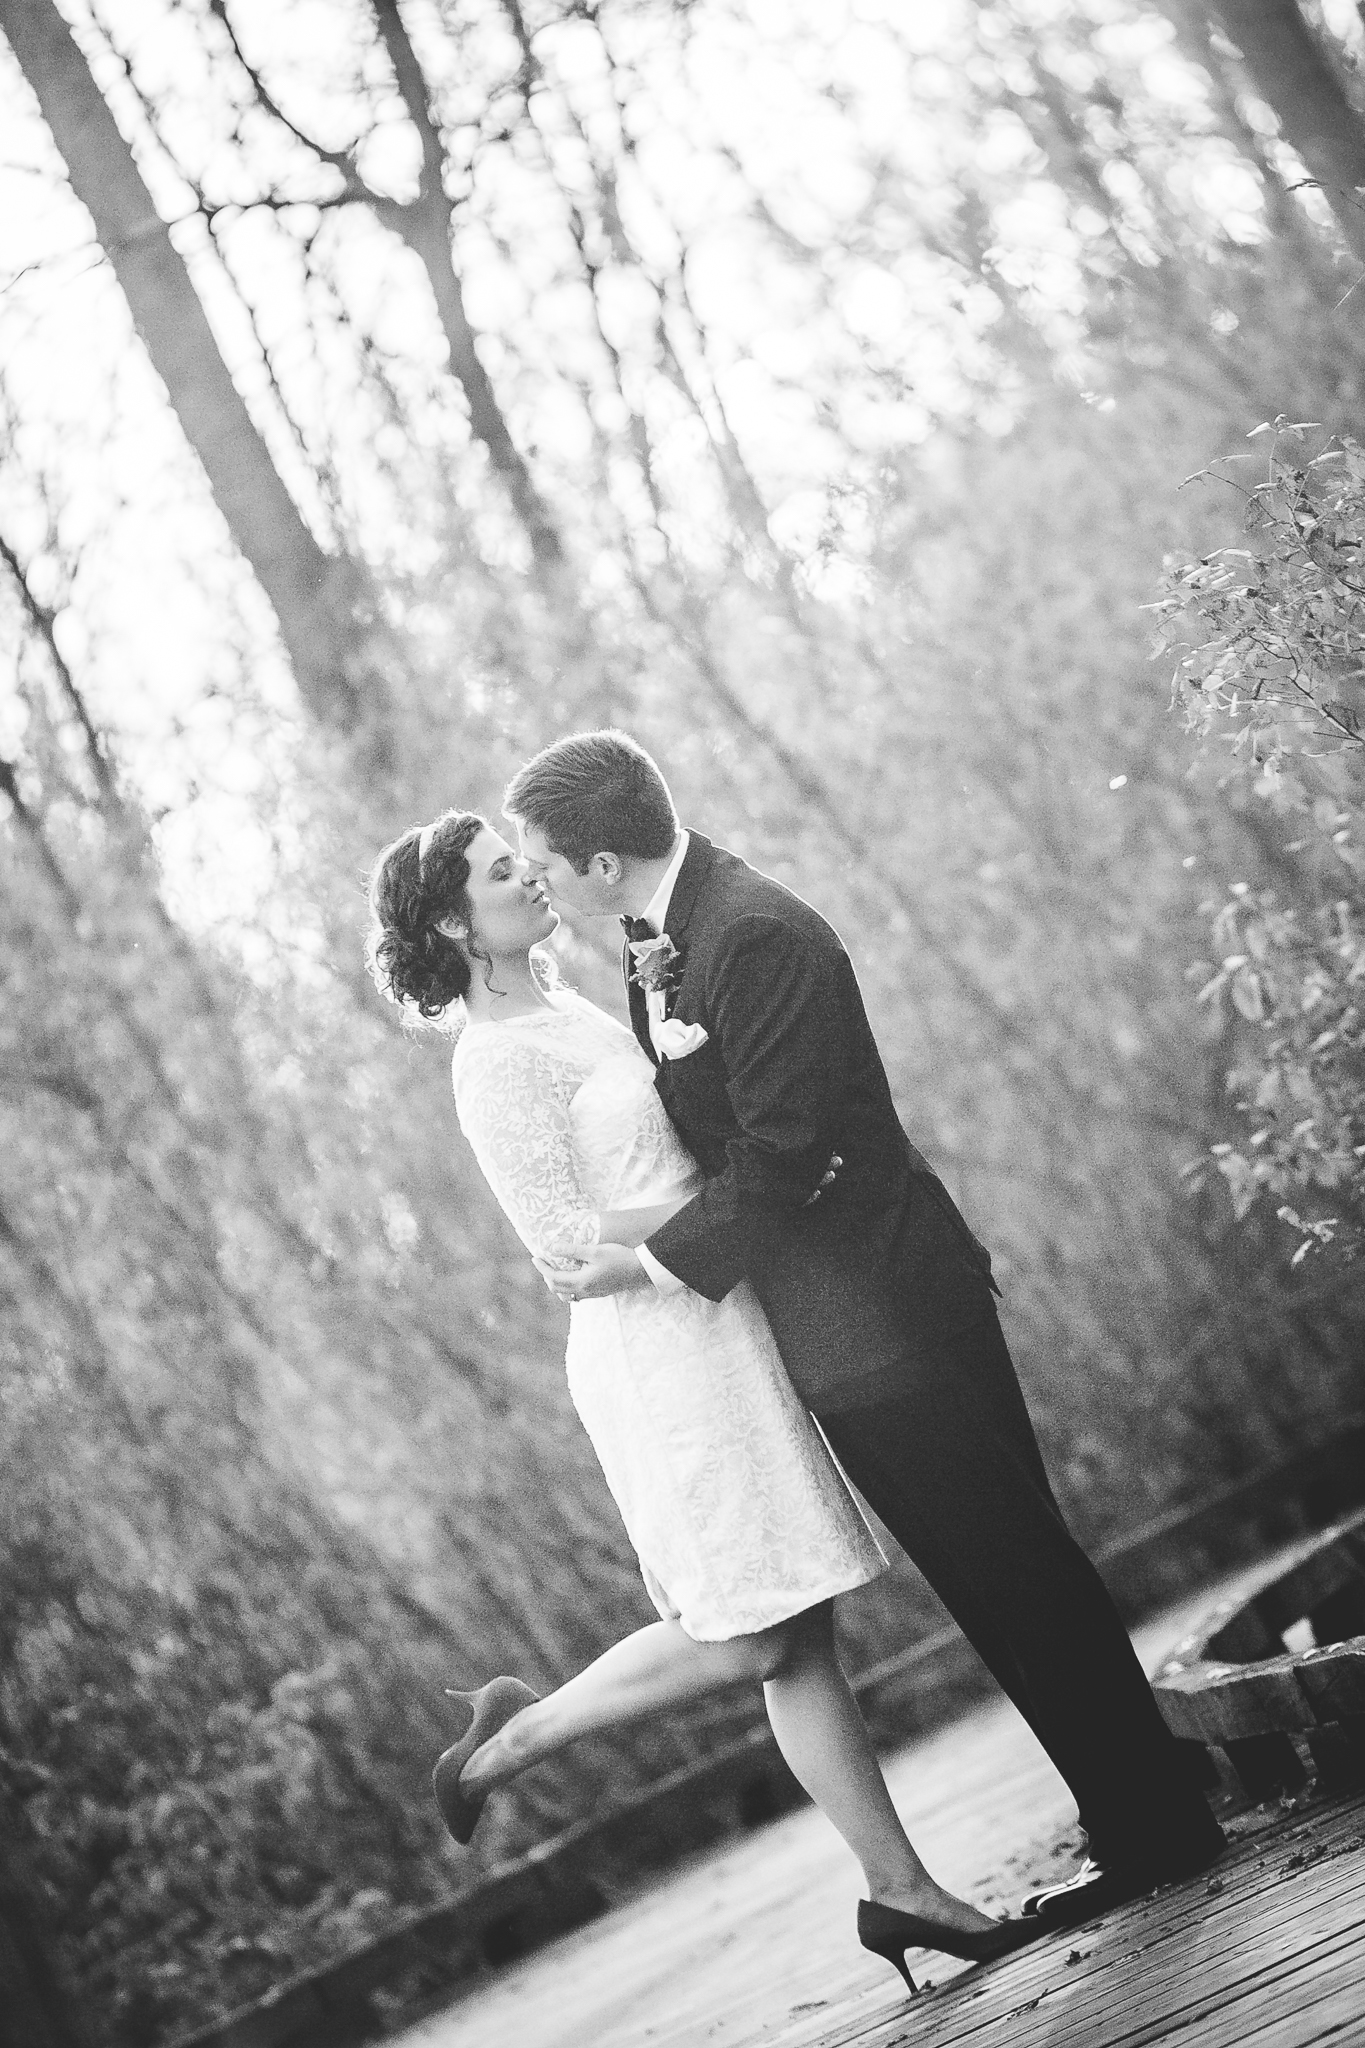 camuglia-whomstudio-chelsea_and_andy-nycphotographer-wedding-brooklyn-buffalo-timberlodge-059-5431.jpg